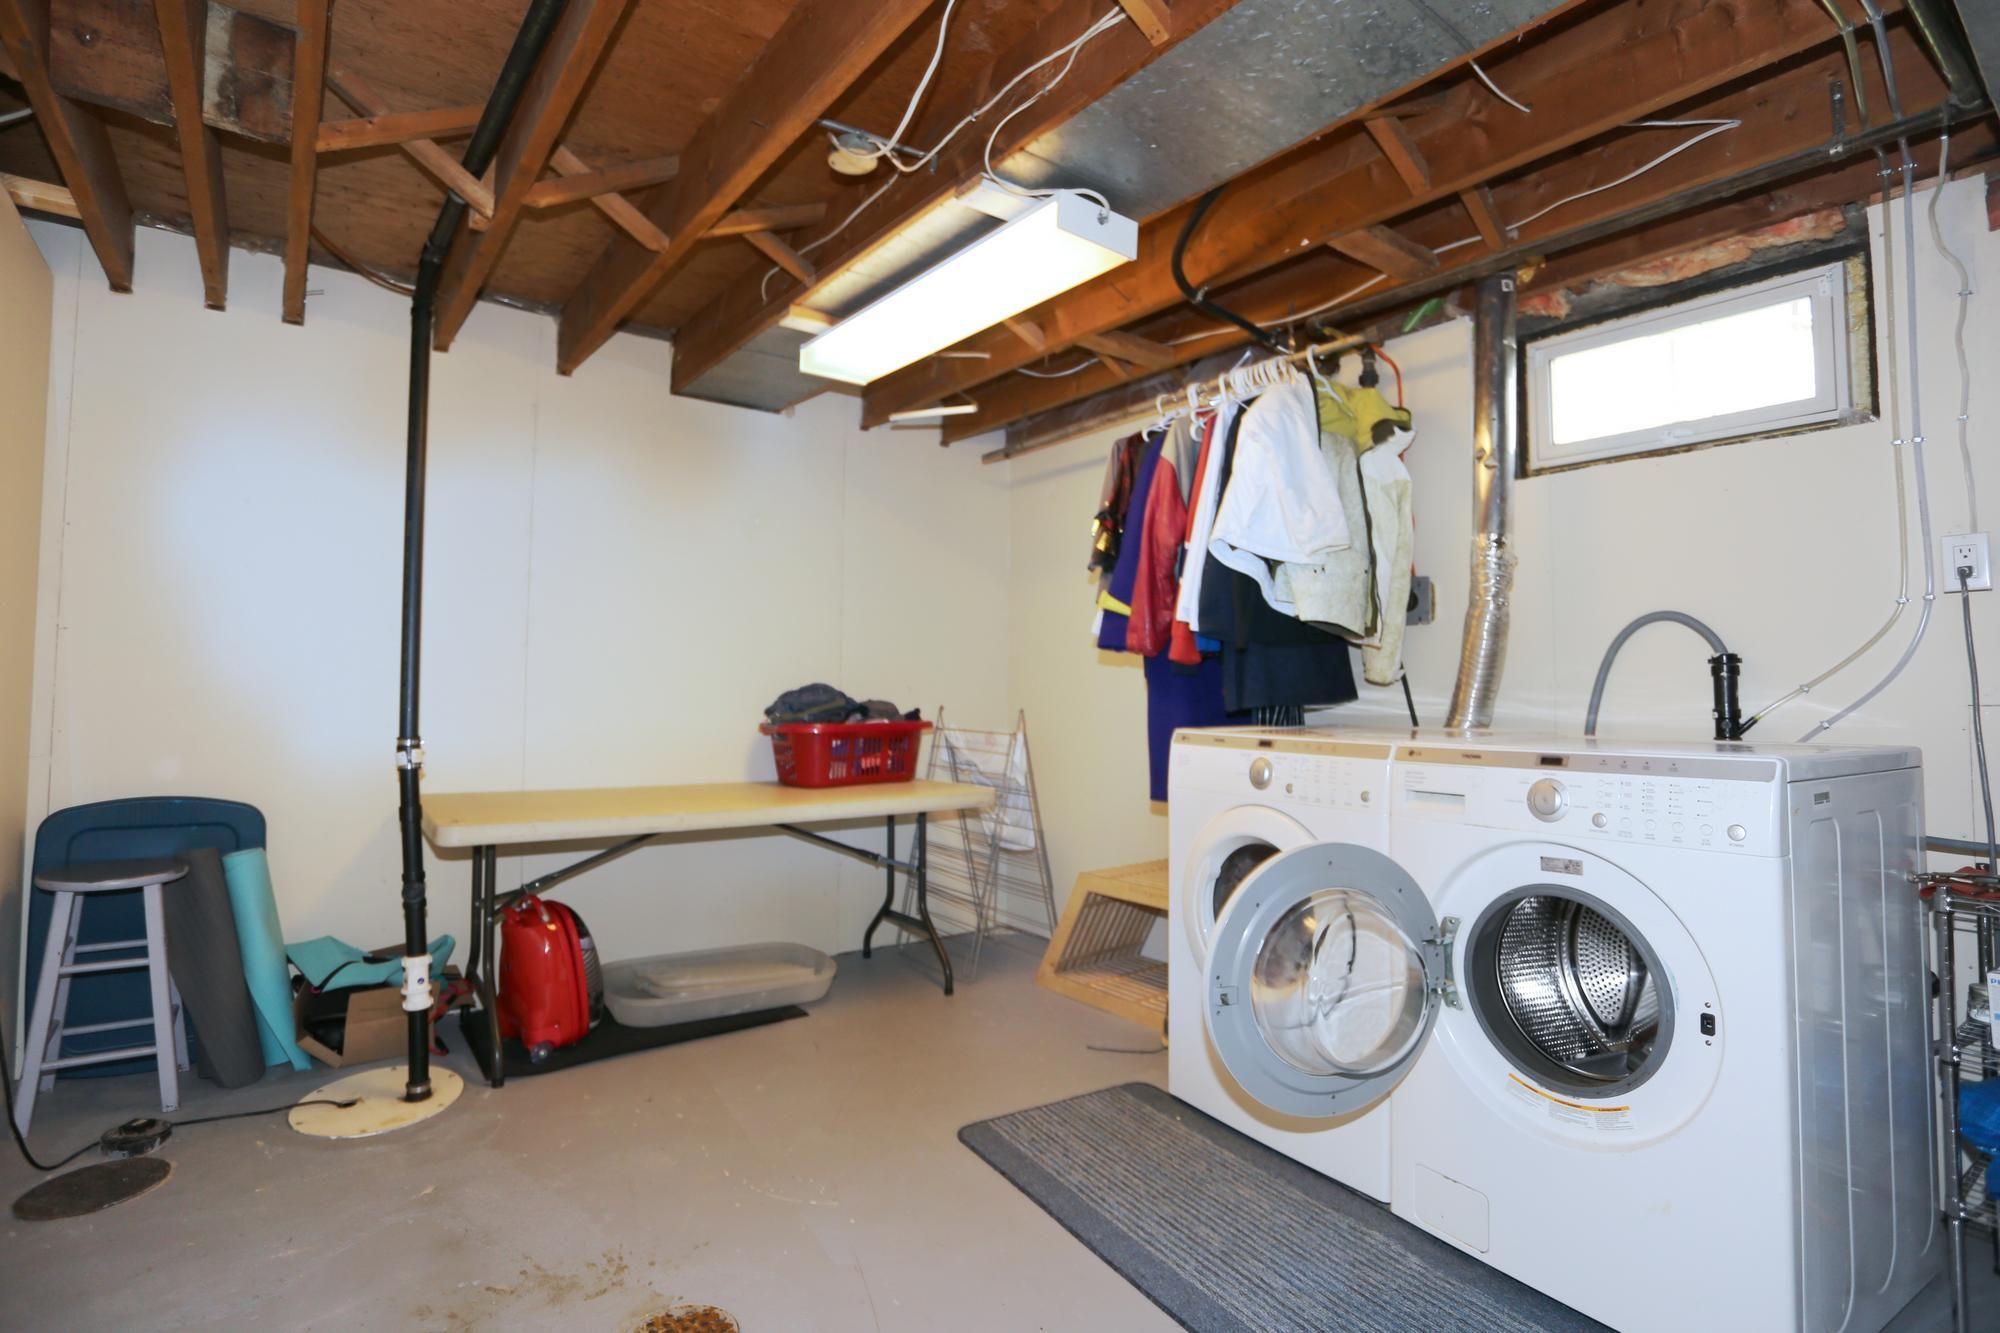 Photo 26: Photos: 1322 Valour Road in Winnipeg: Sargent Park Single Family Detached for sale (5C)  : MLS®# 1811835